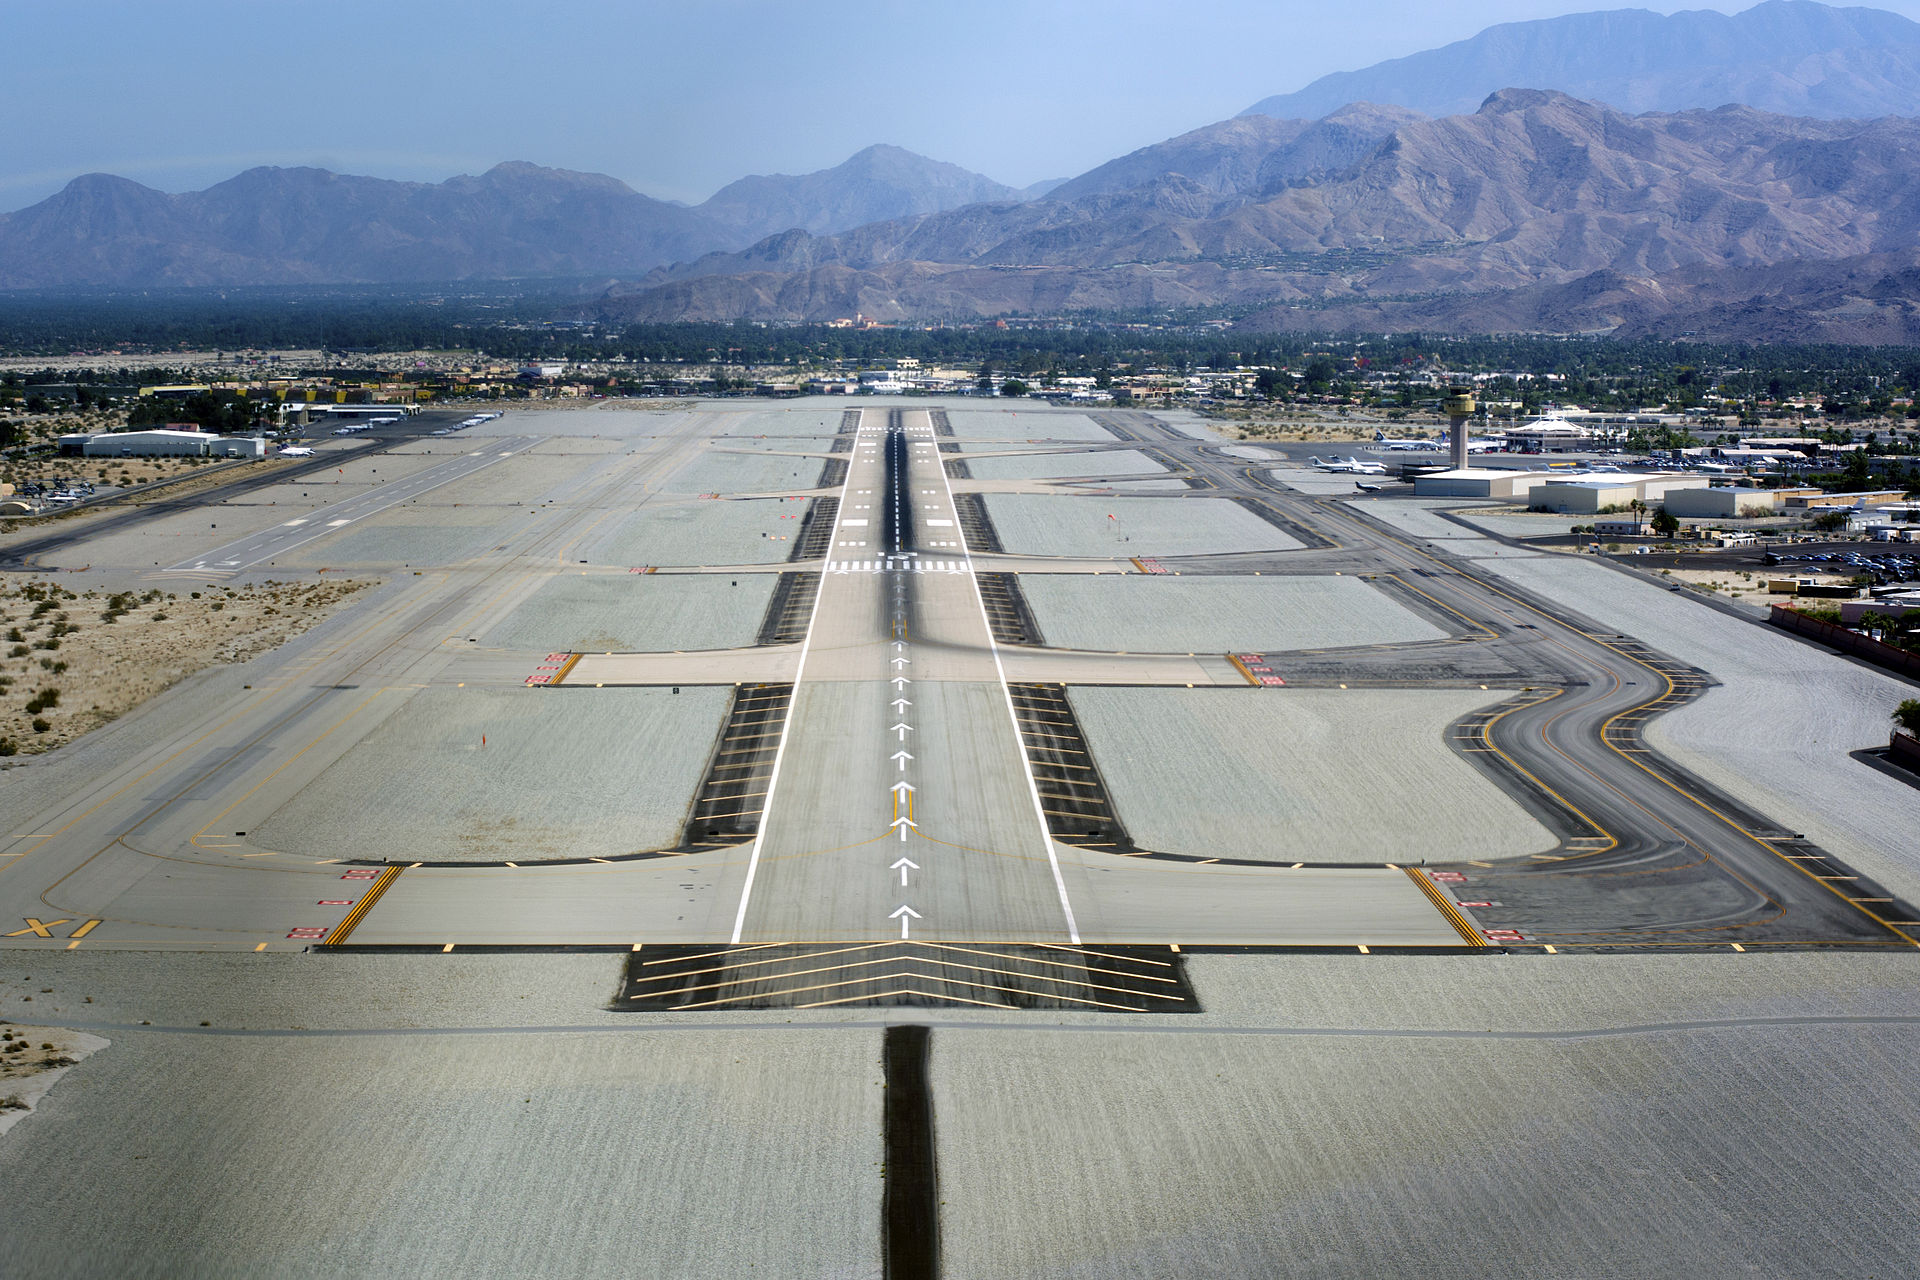 Palm_Springs_International_Airport_photo_D_Ramey_Logan.jpg